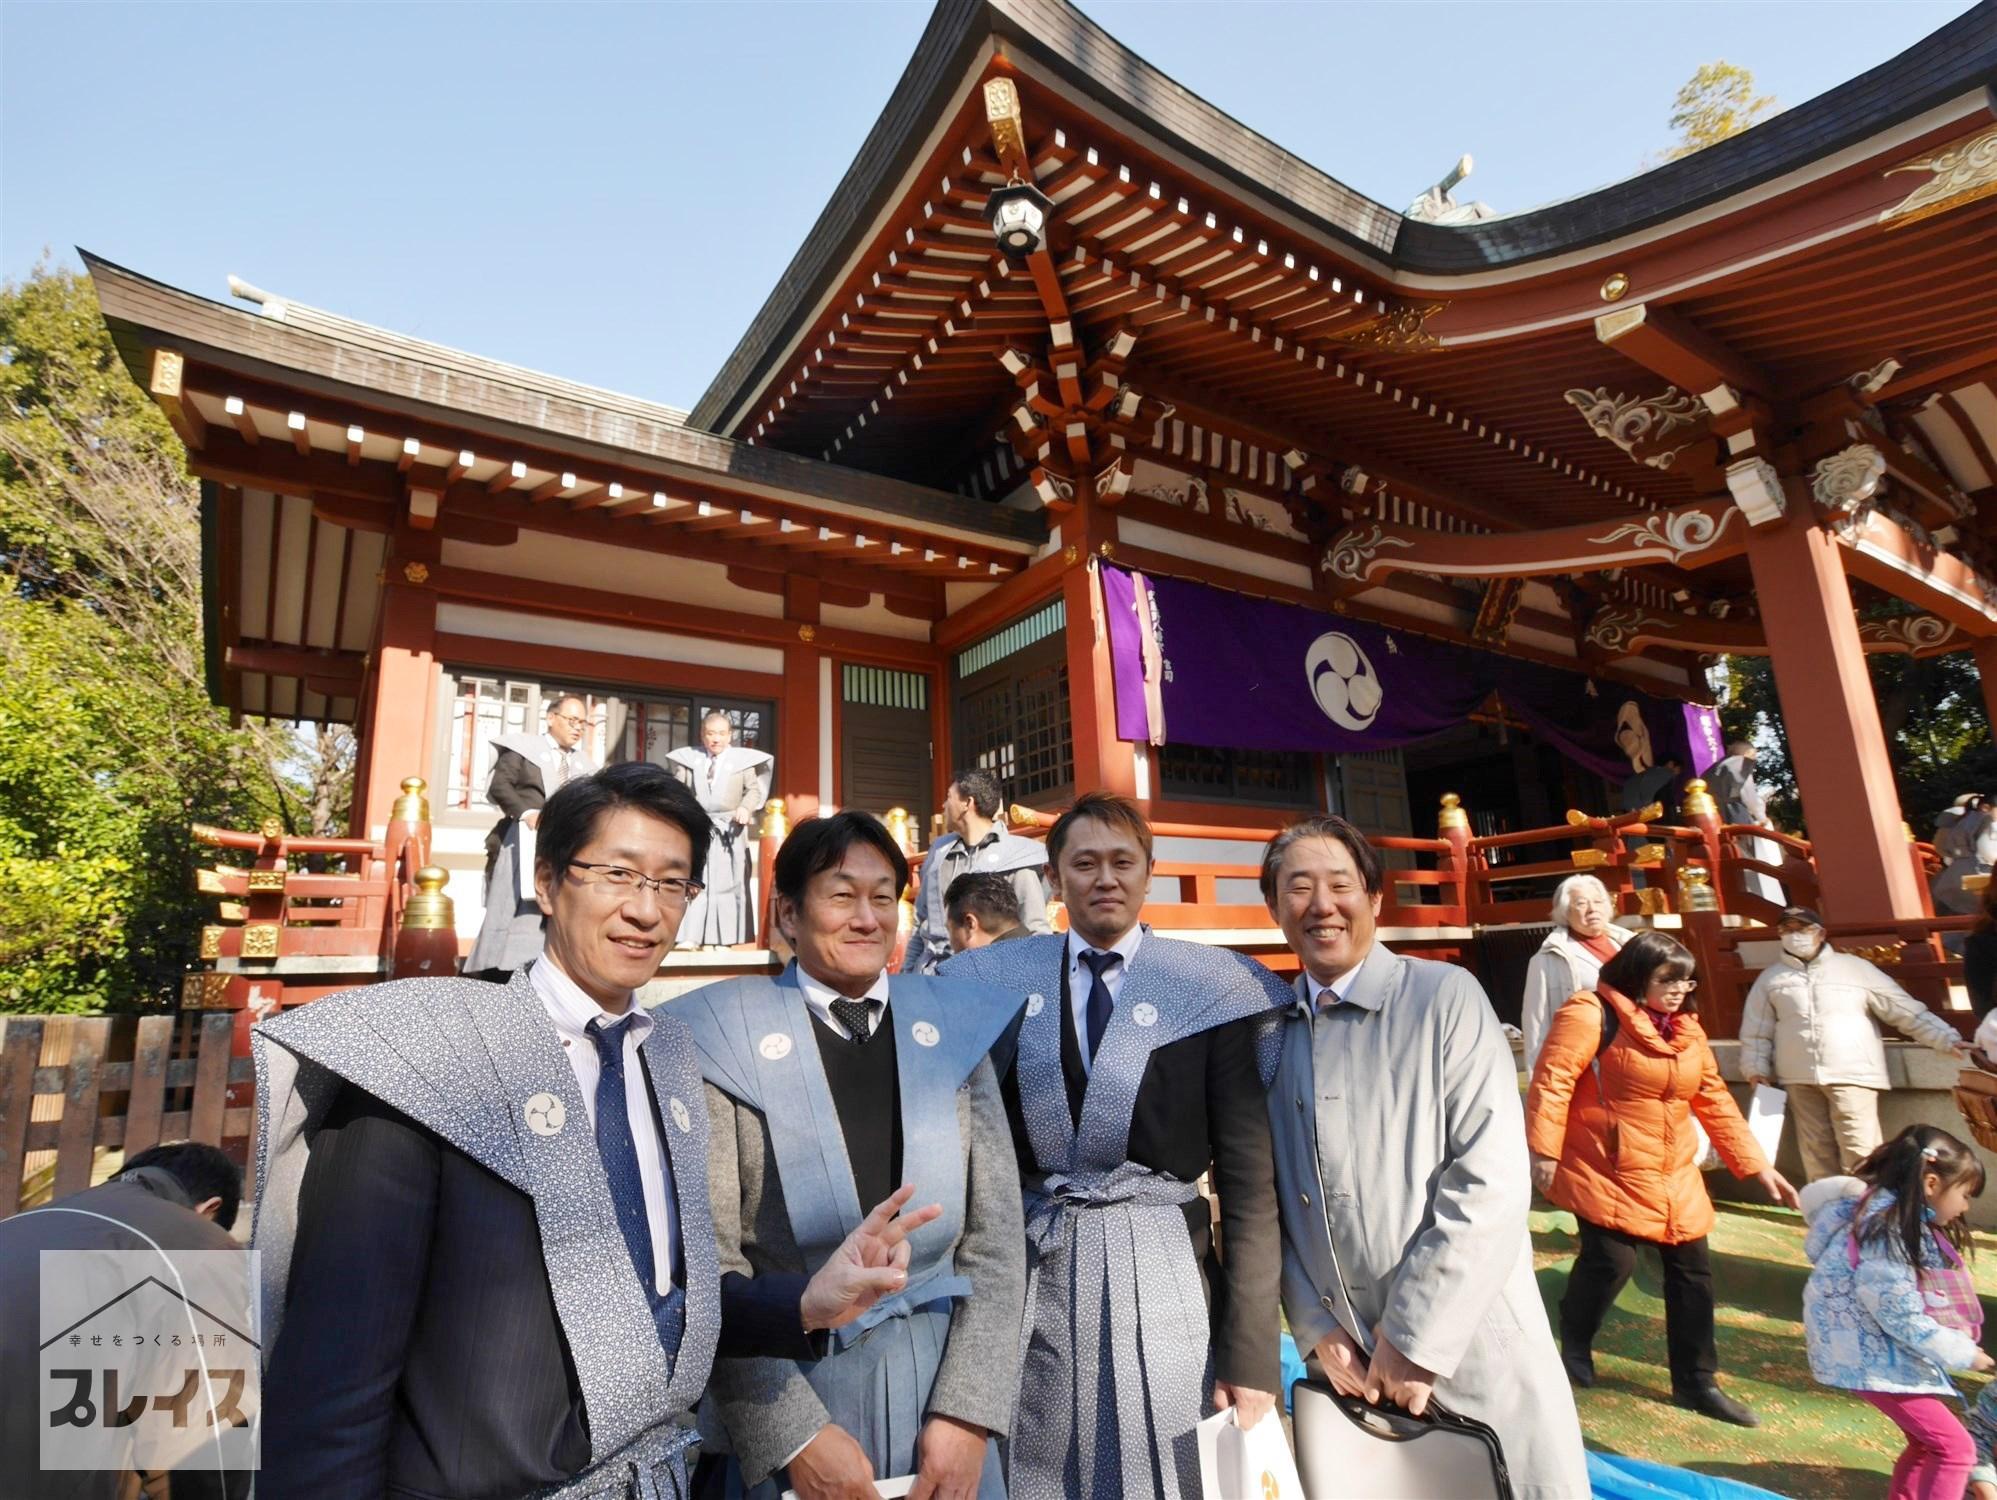 LA20190203-武蔵野八幡宮-節分祭 (47).jpg